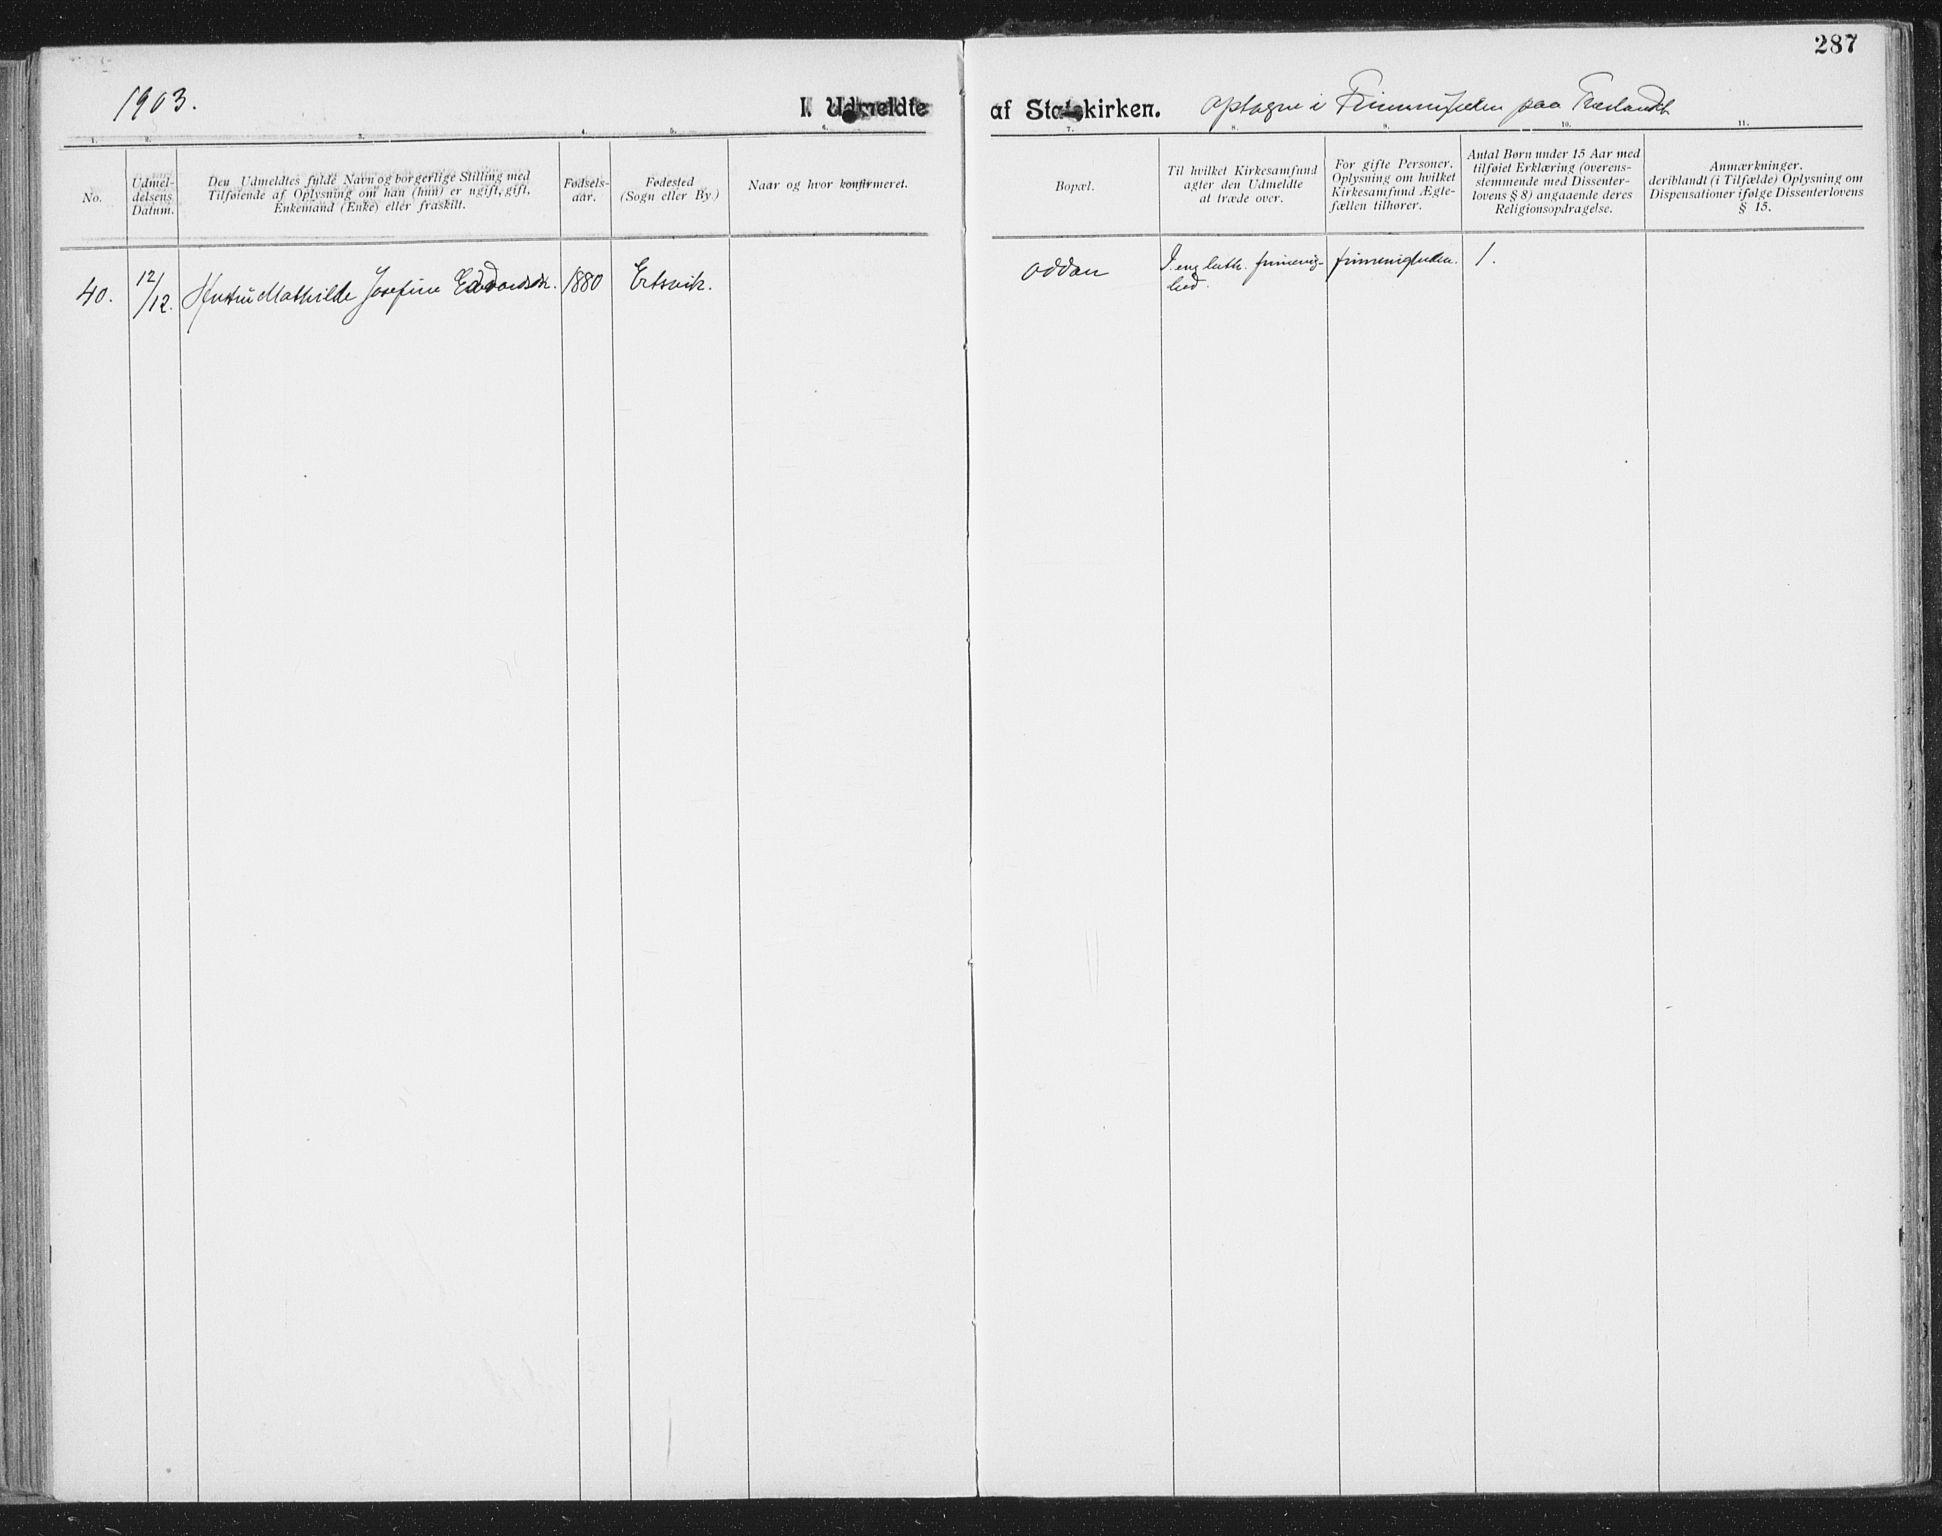 SAT, Ministerialprotokoller, klokkerbøker og fødselsregistre - Nordland, 804/L0081: Ministerialbok nr. 804A02, 1901-1915, s. 287